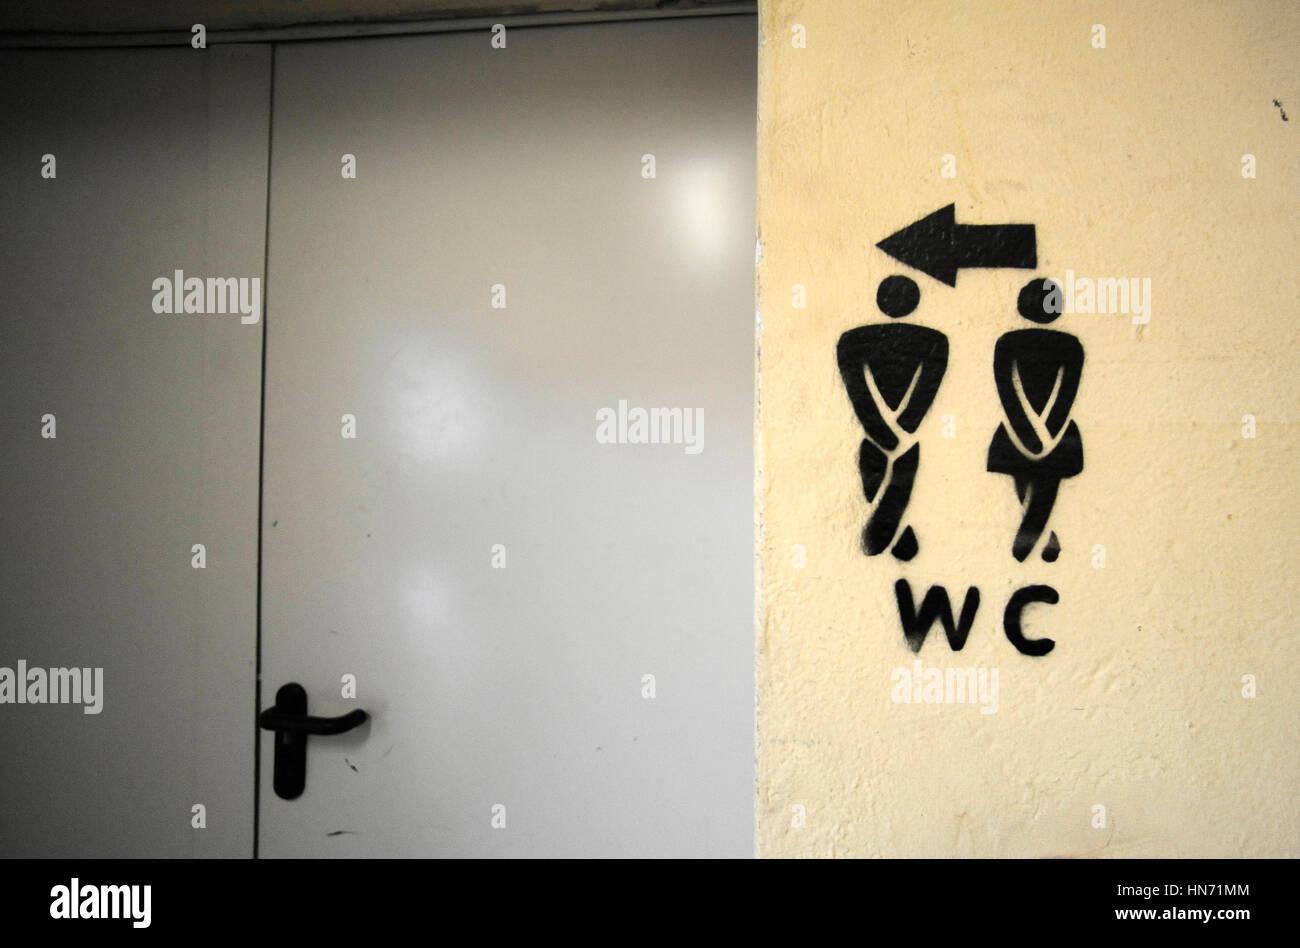 Berlin toilet sign - Stock Image